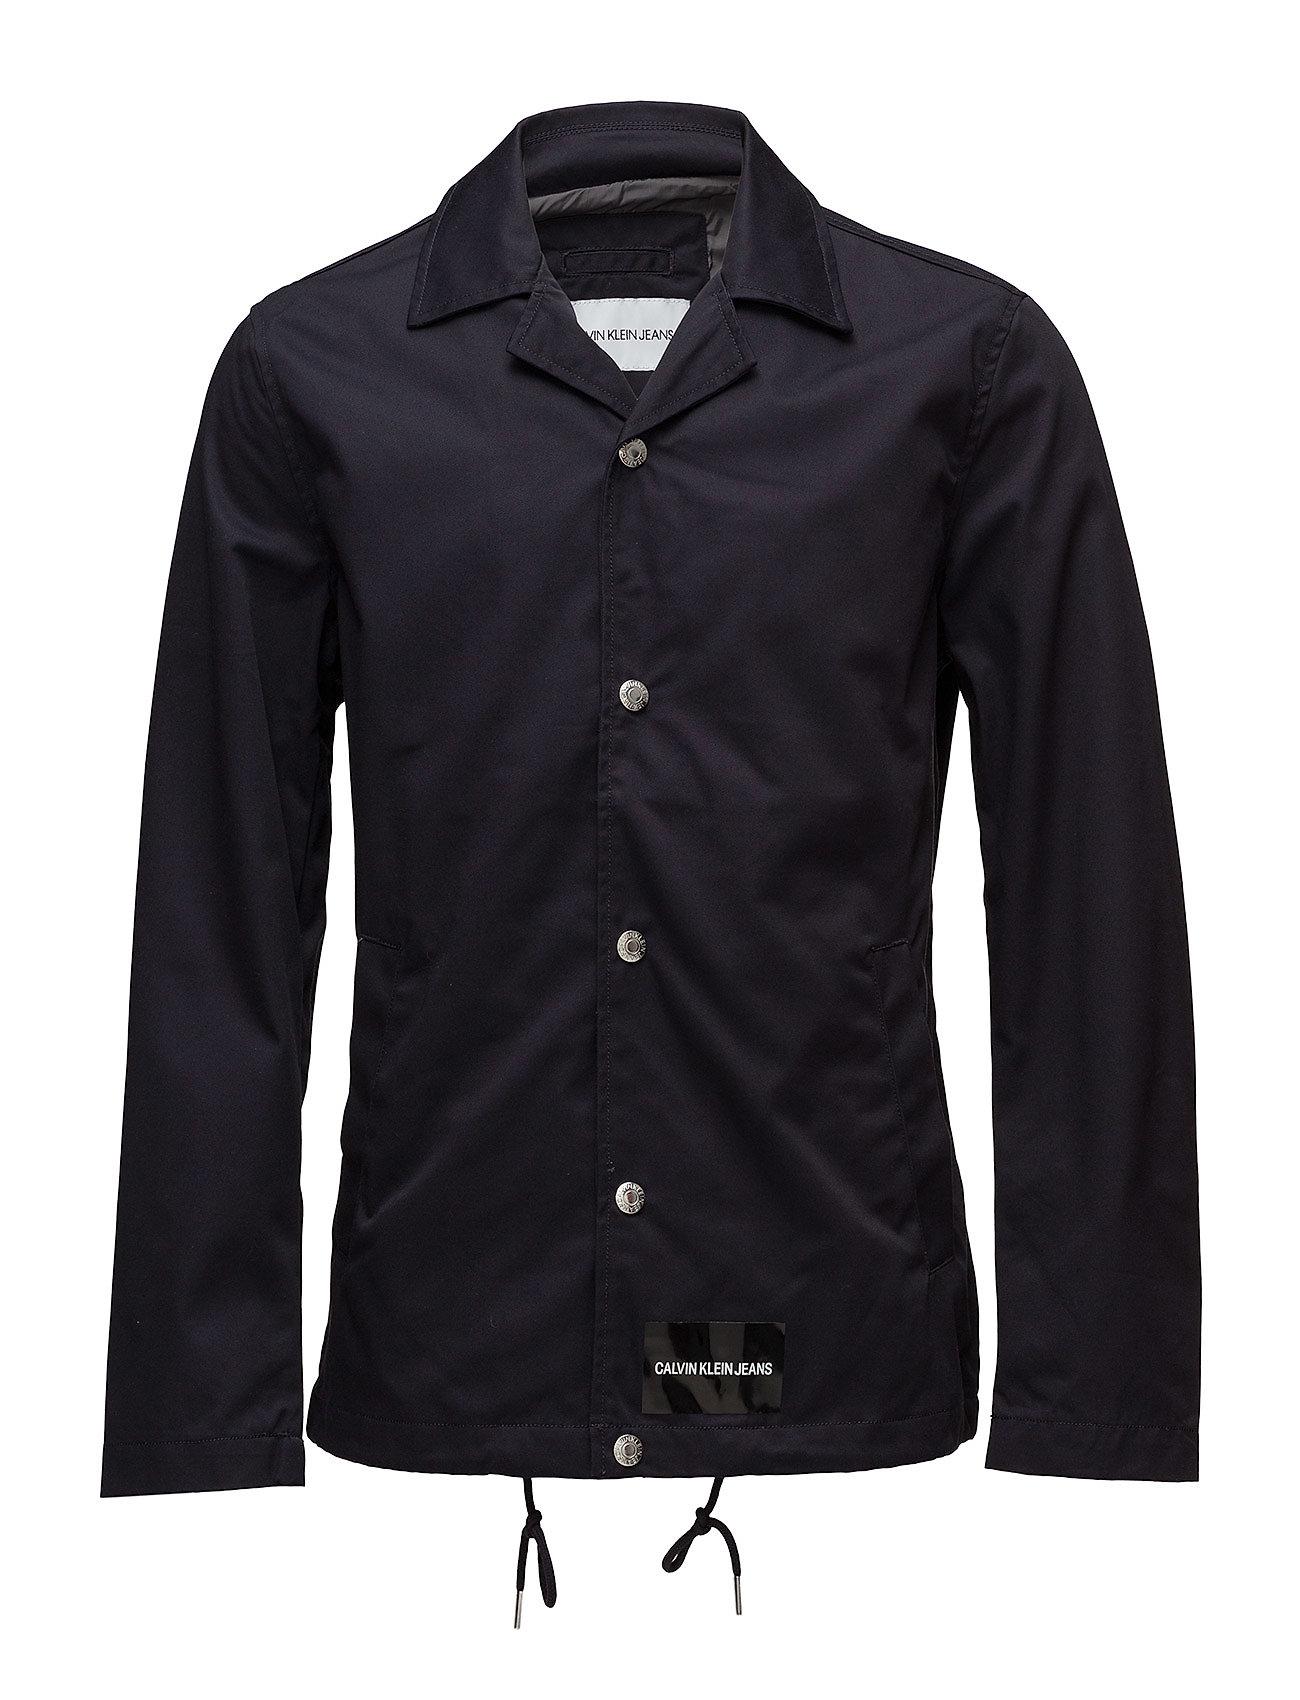 Calvin Klein Jeans INSTITUTIONAL LOGO COACH JACKET - NIGHT SKY